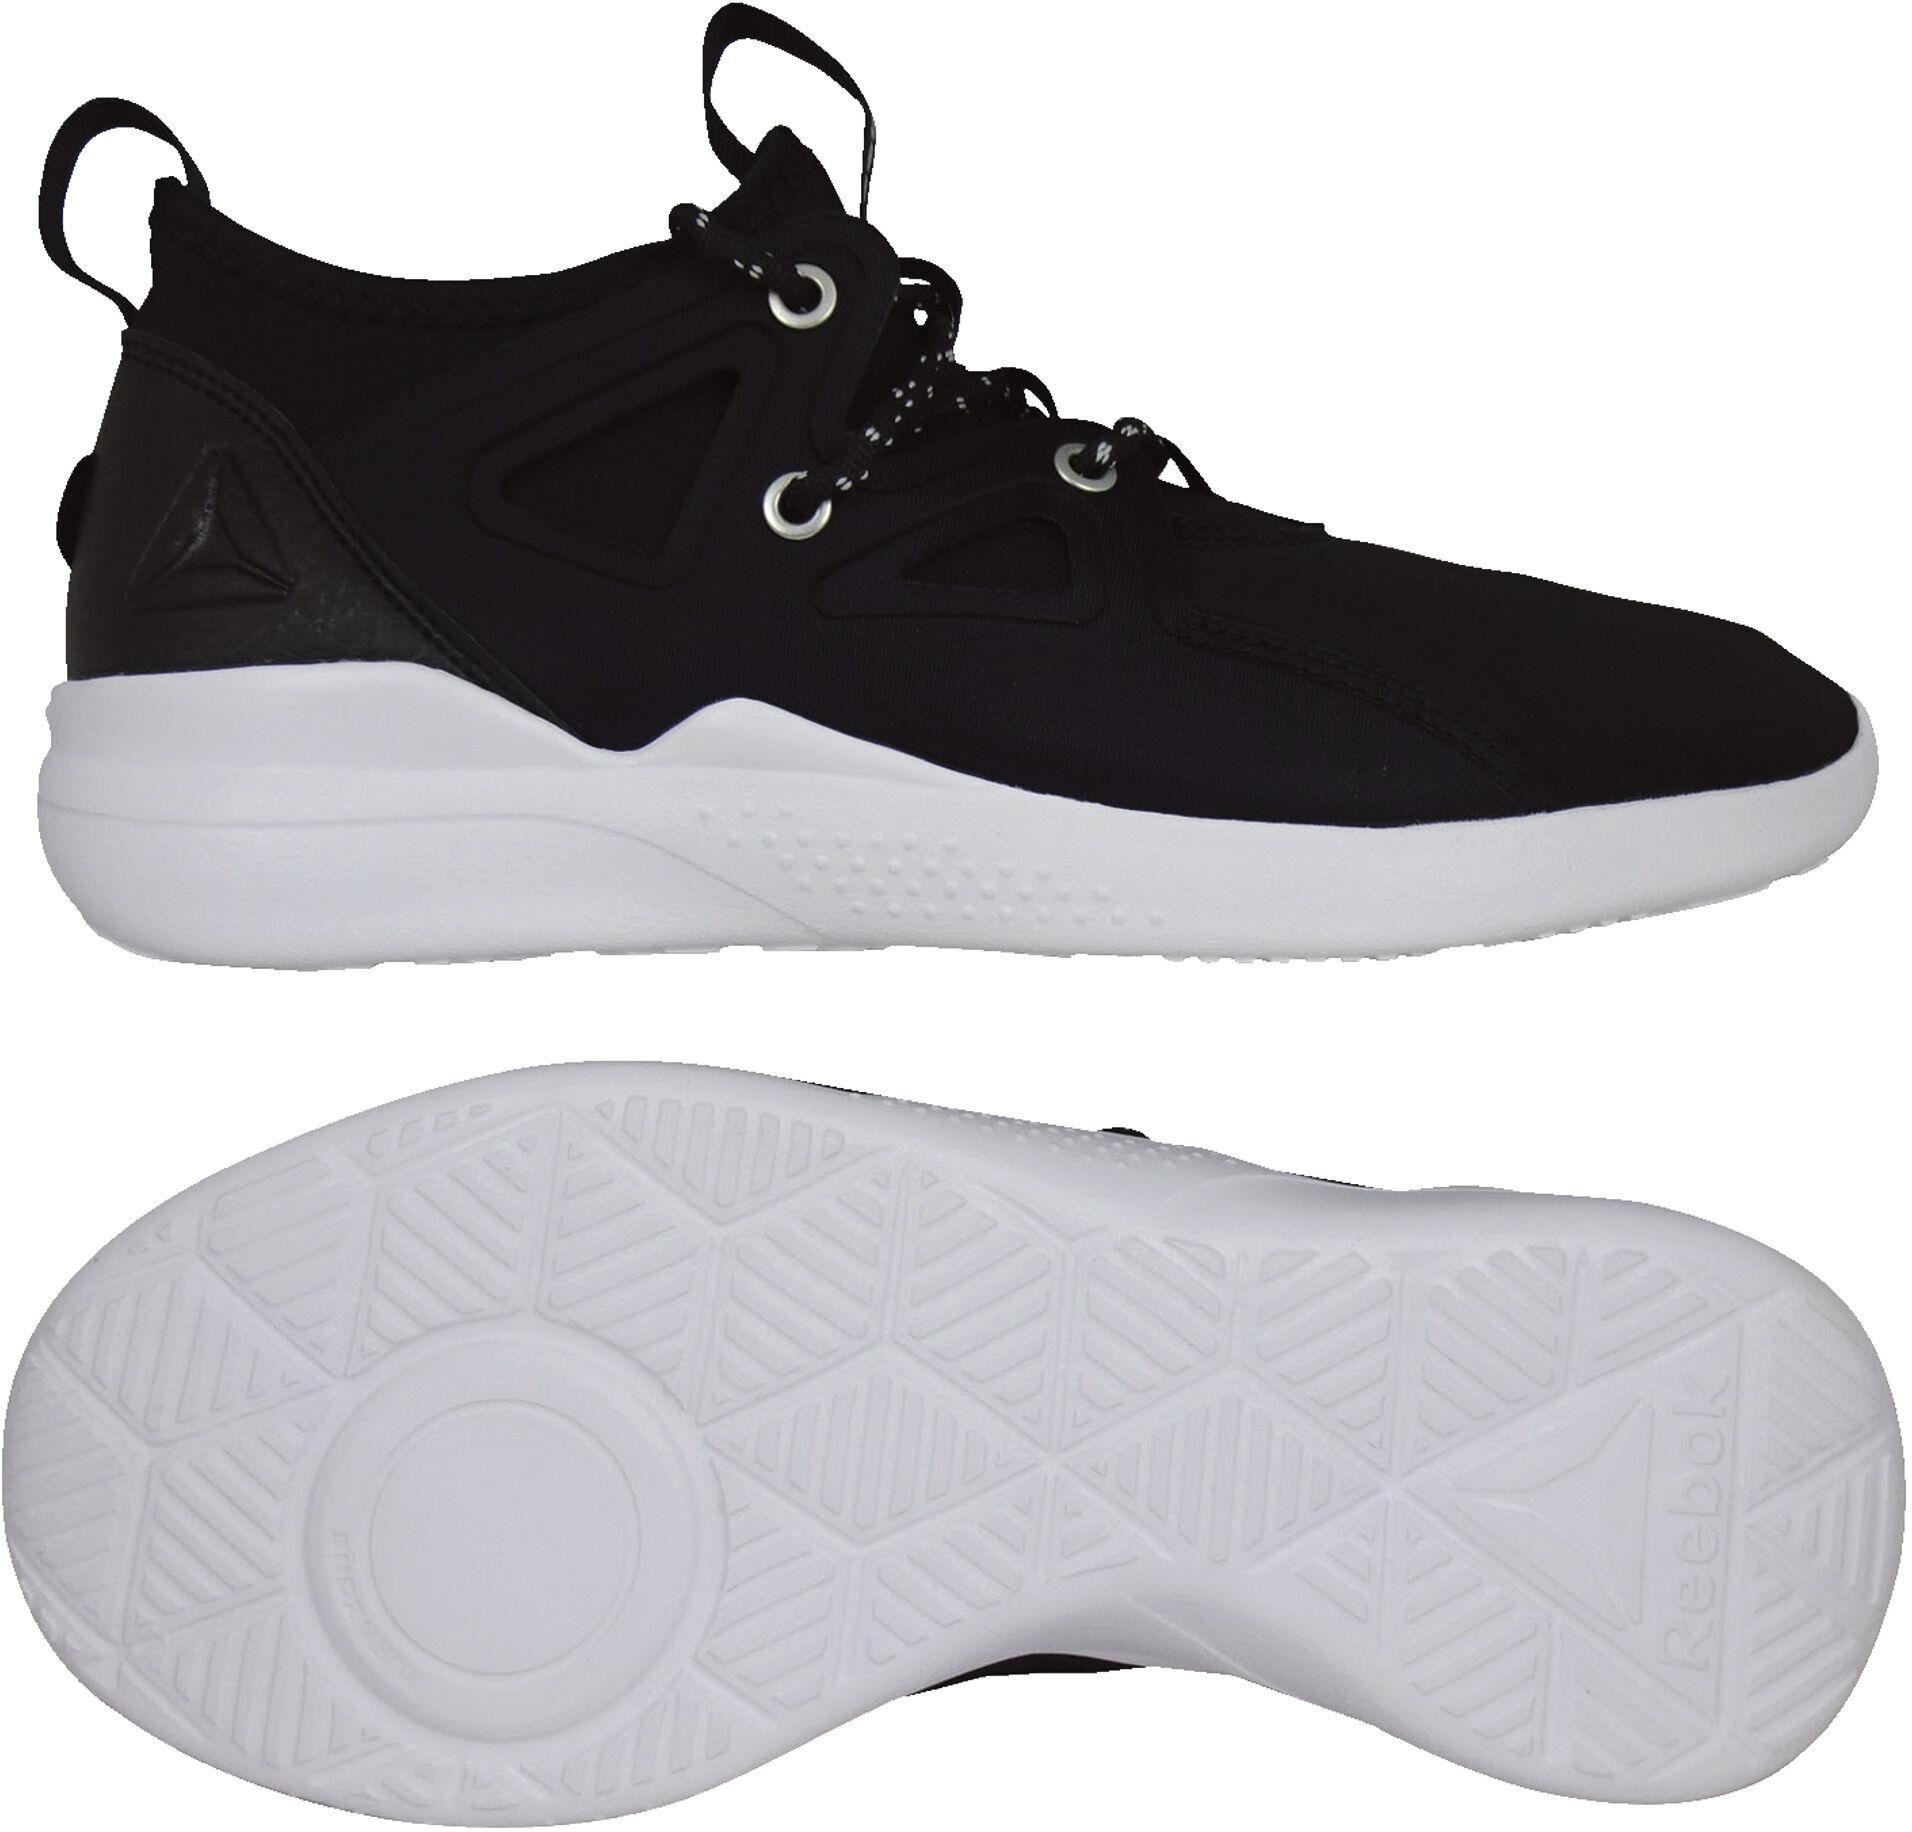 Sportkledingamp; AccessoiresIntersport AccessoiresIntersport Reebok Sportkledingamp; Reebok Reebok 43jLRcq5A